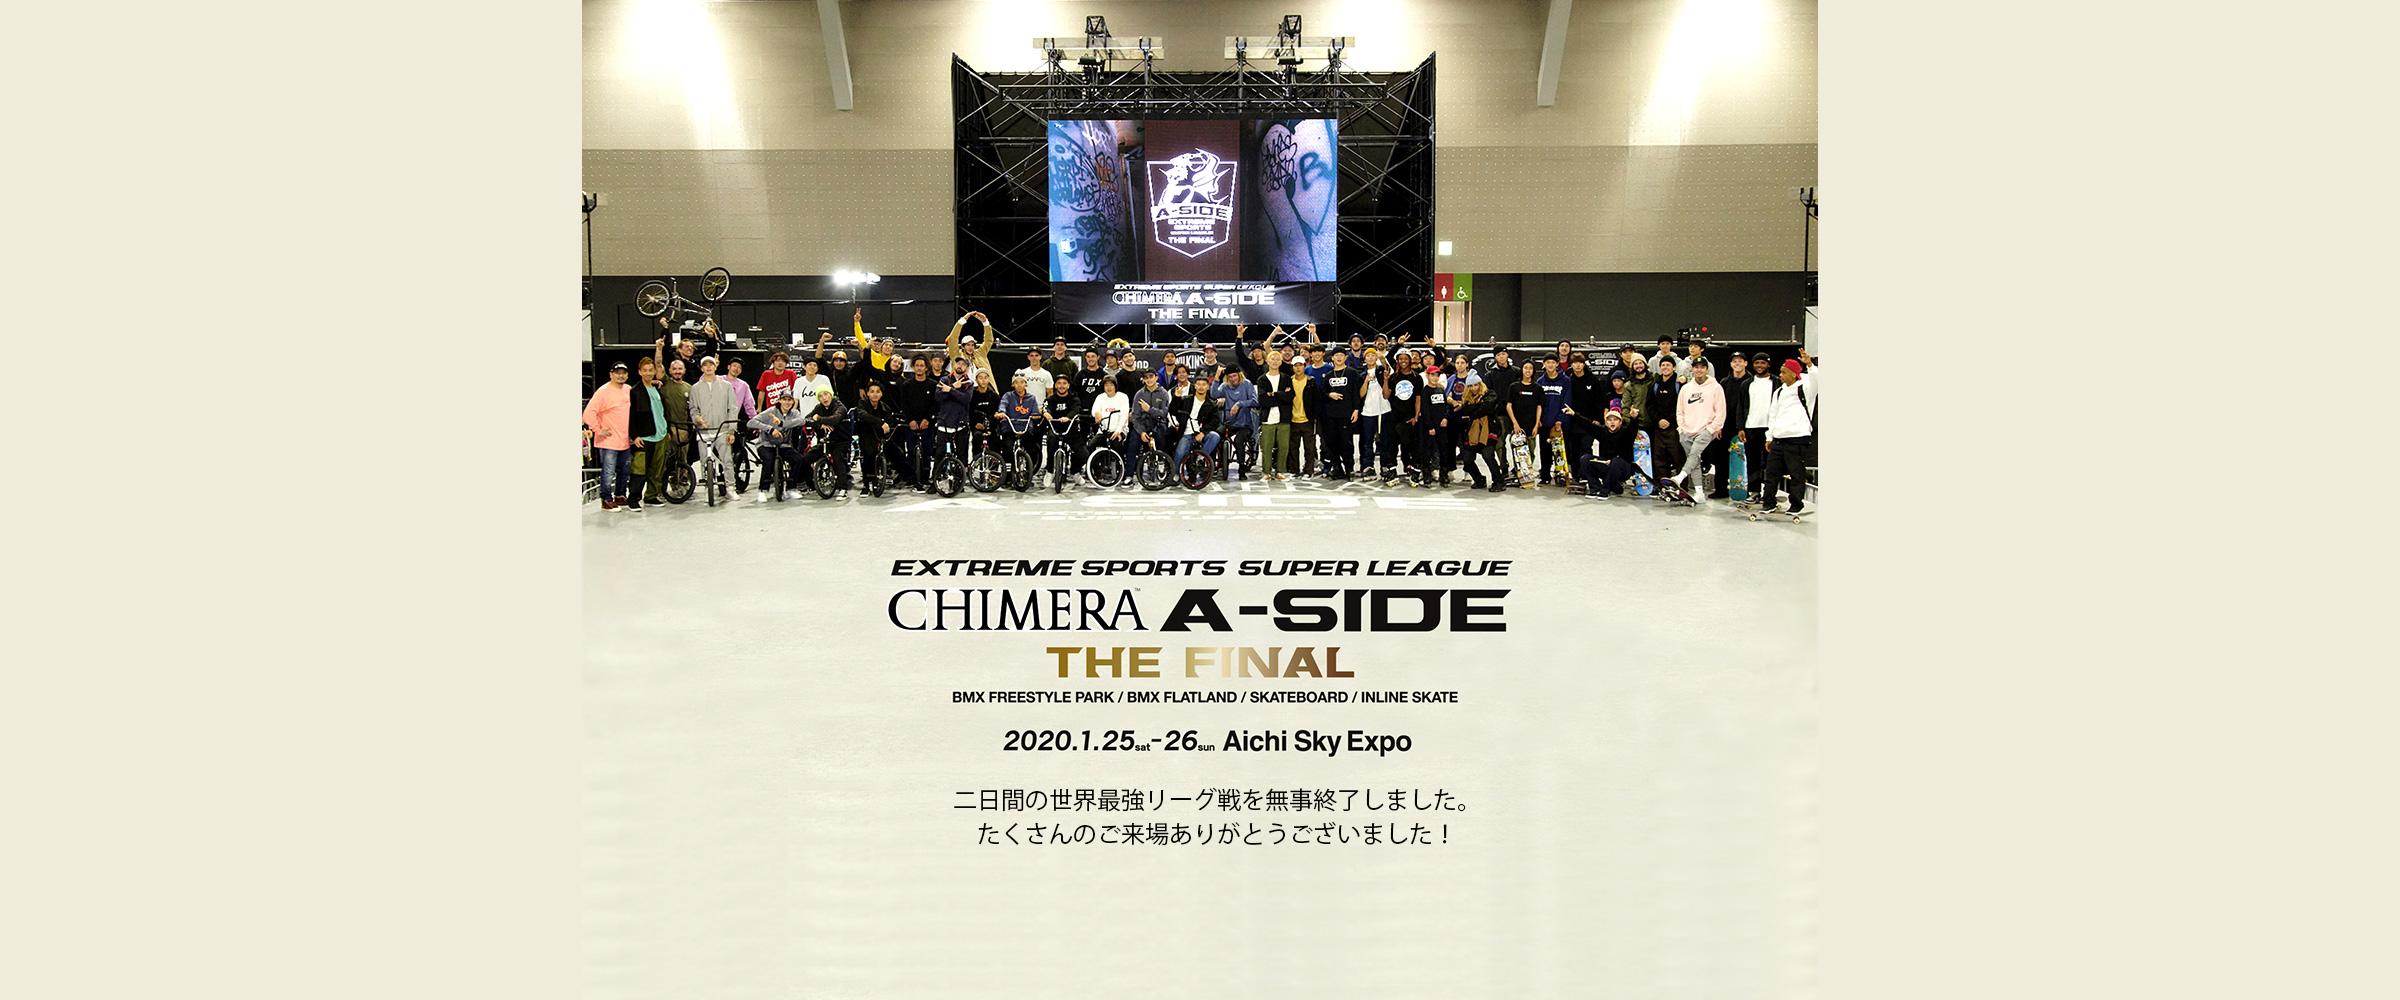 CHIMERA A-SIDEのTHE-FINAL-2019のスライダーによるキービジュアル